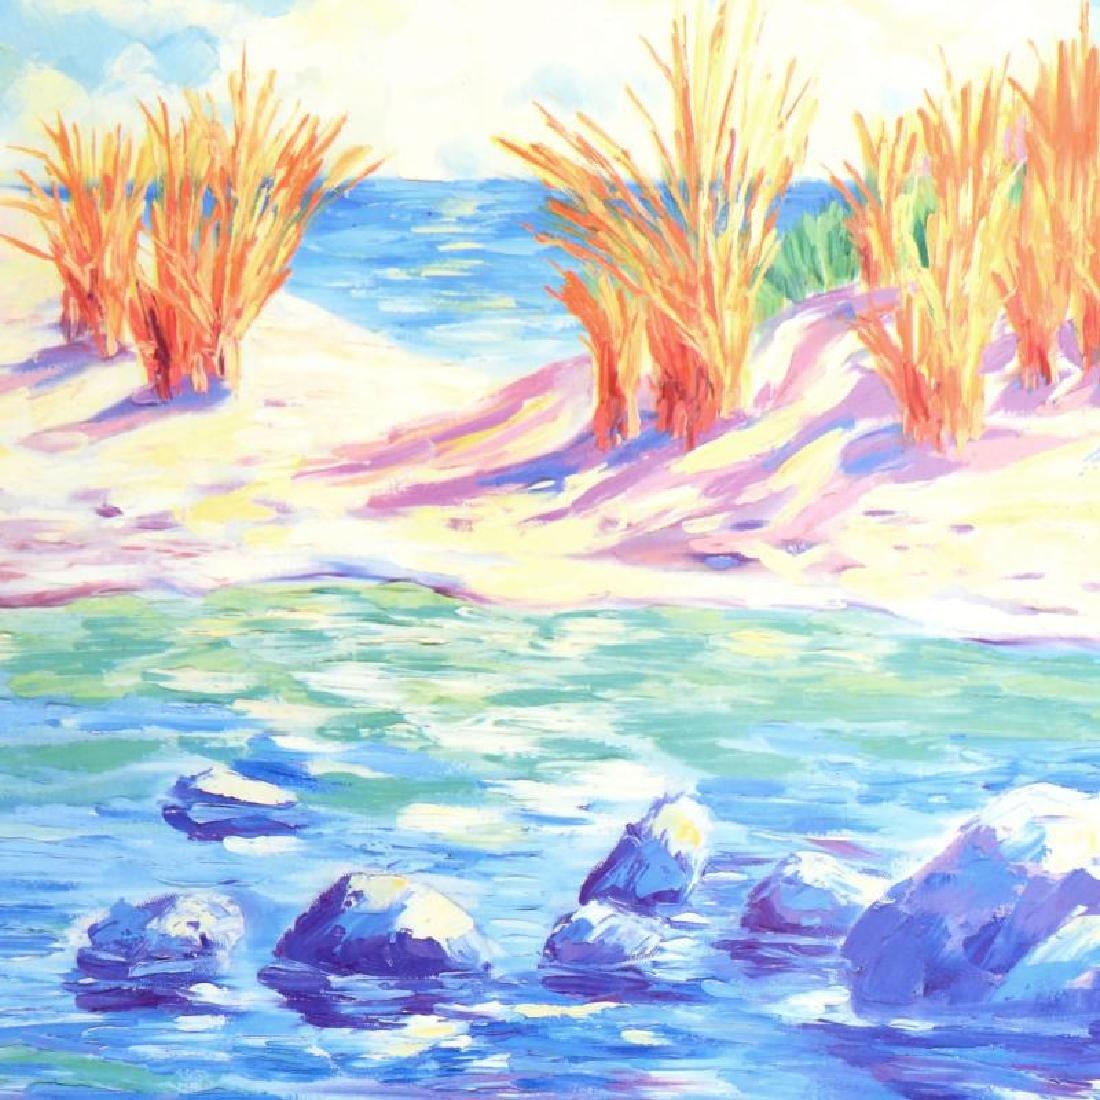 La Playa Arenosa by Adam - 2